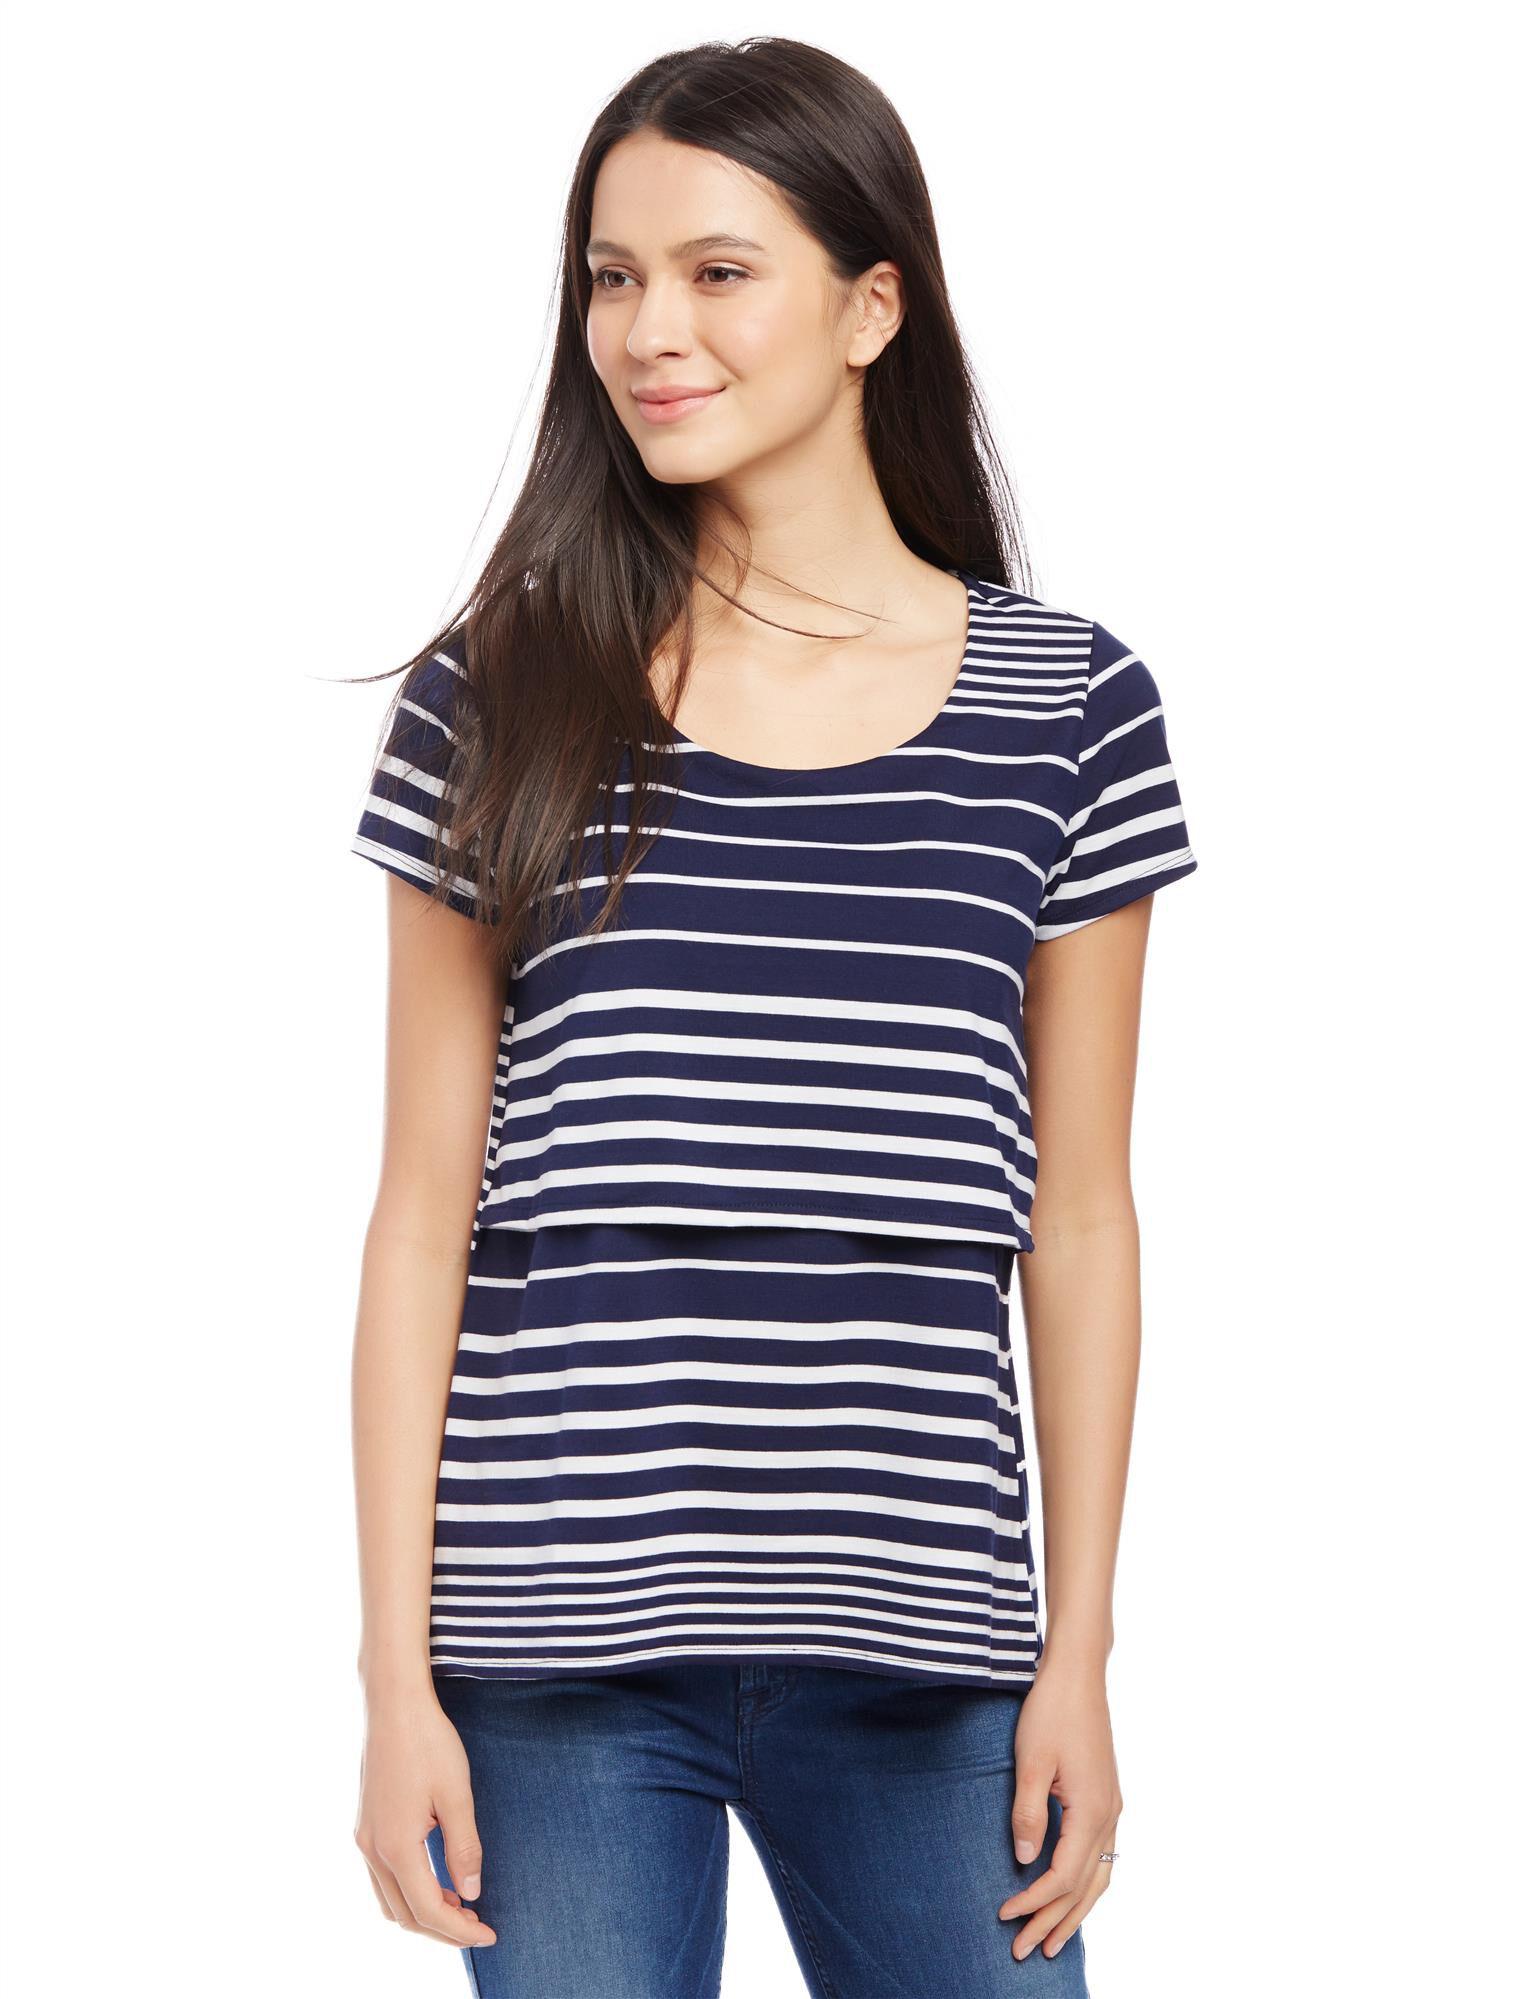 Lift Up Slim Fit Nursing Shirt